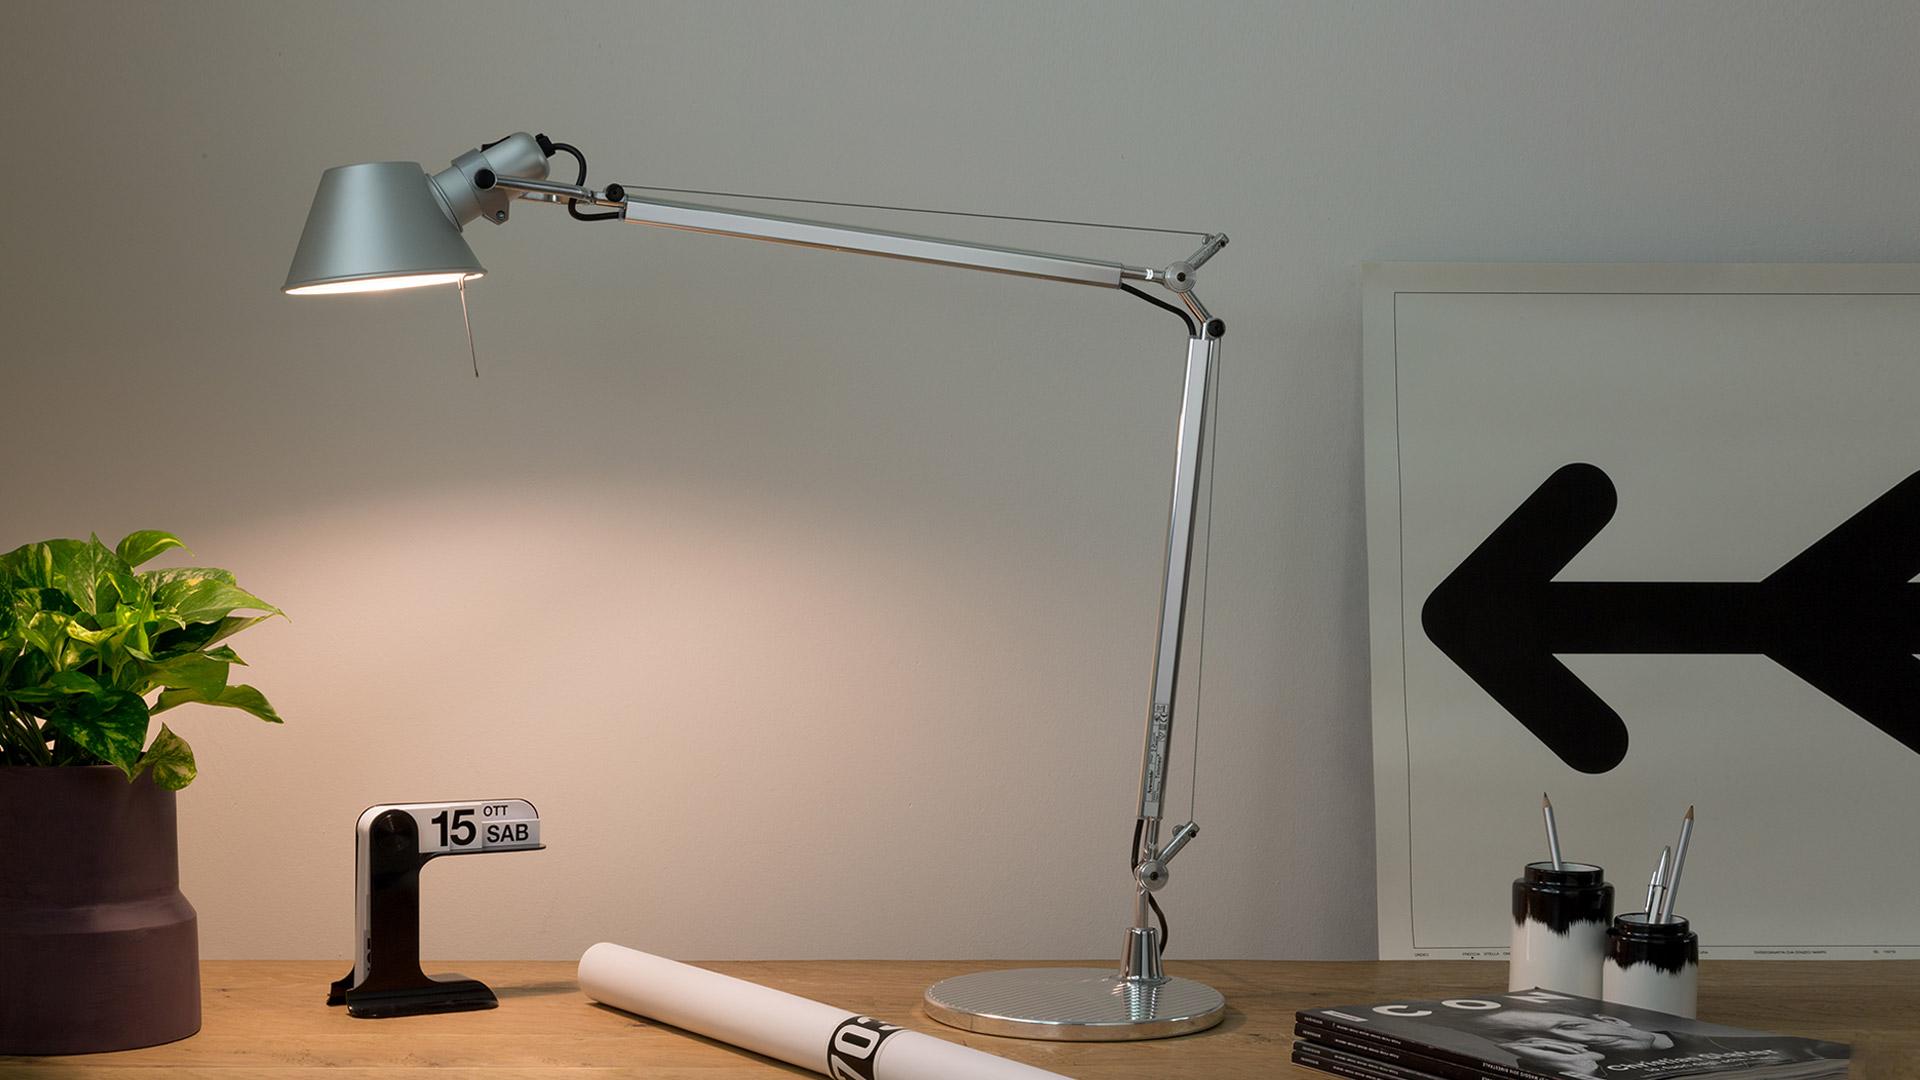 squarerooms tolomeo artemide table lamp grey work desk light iconic designer